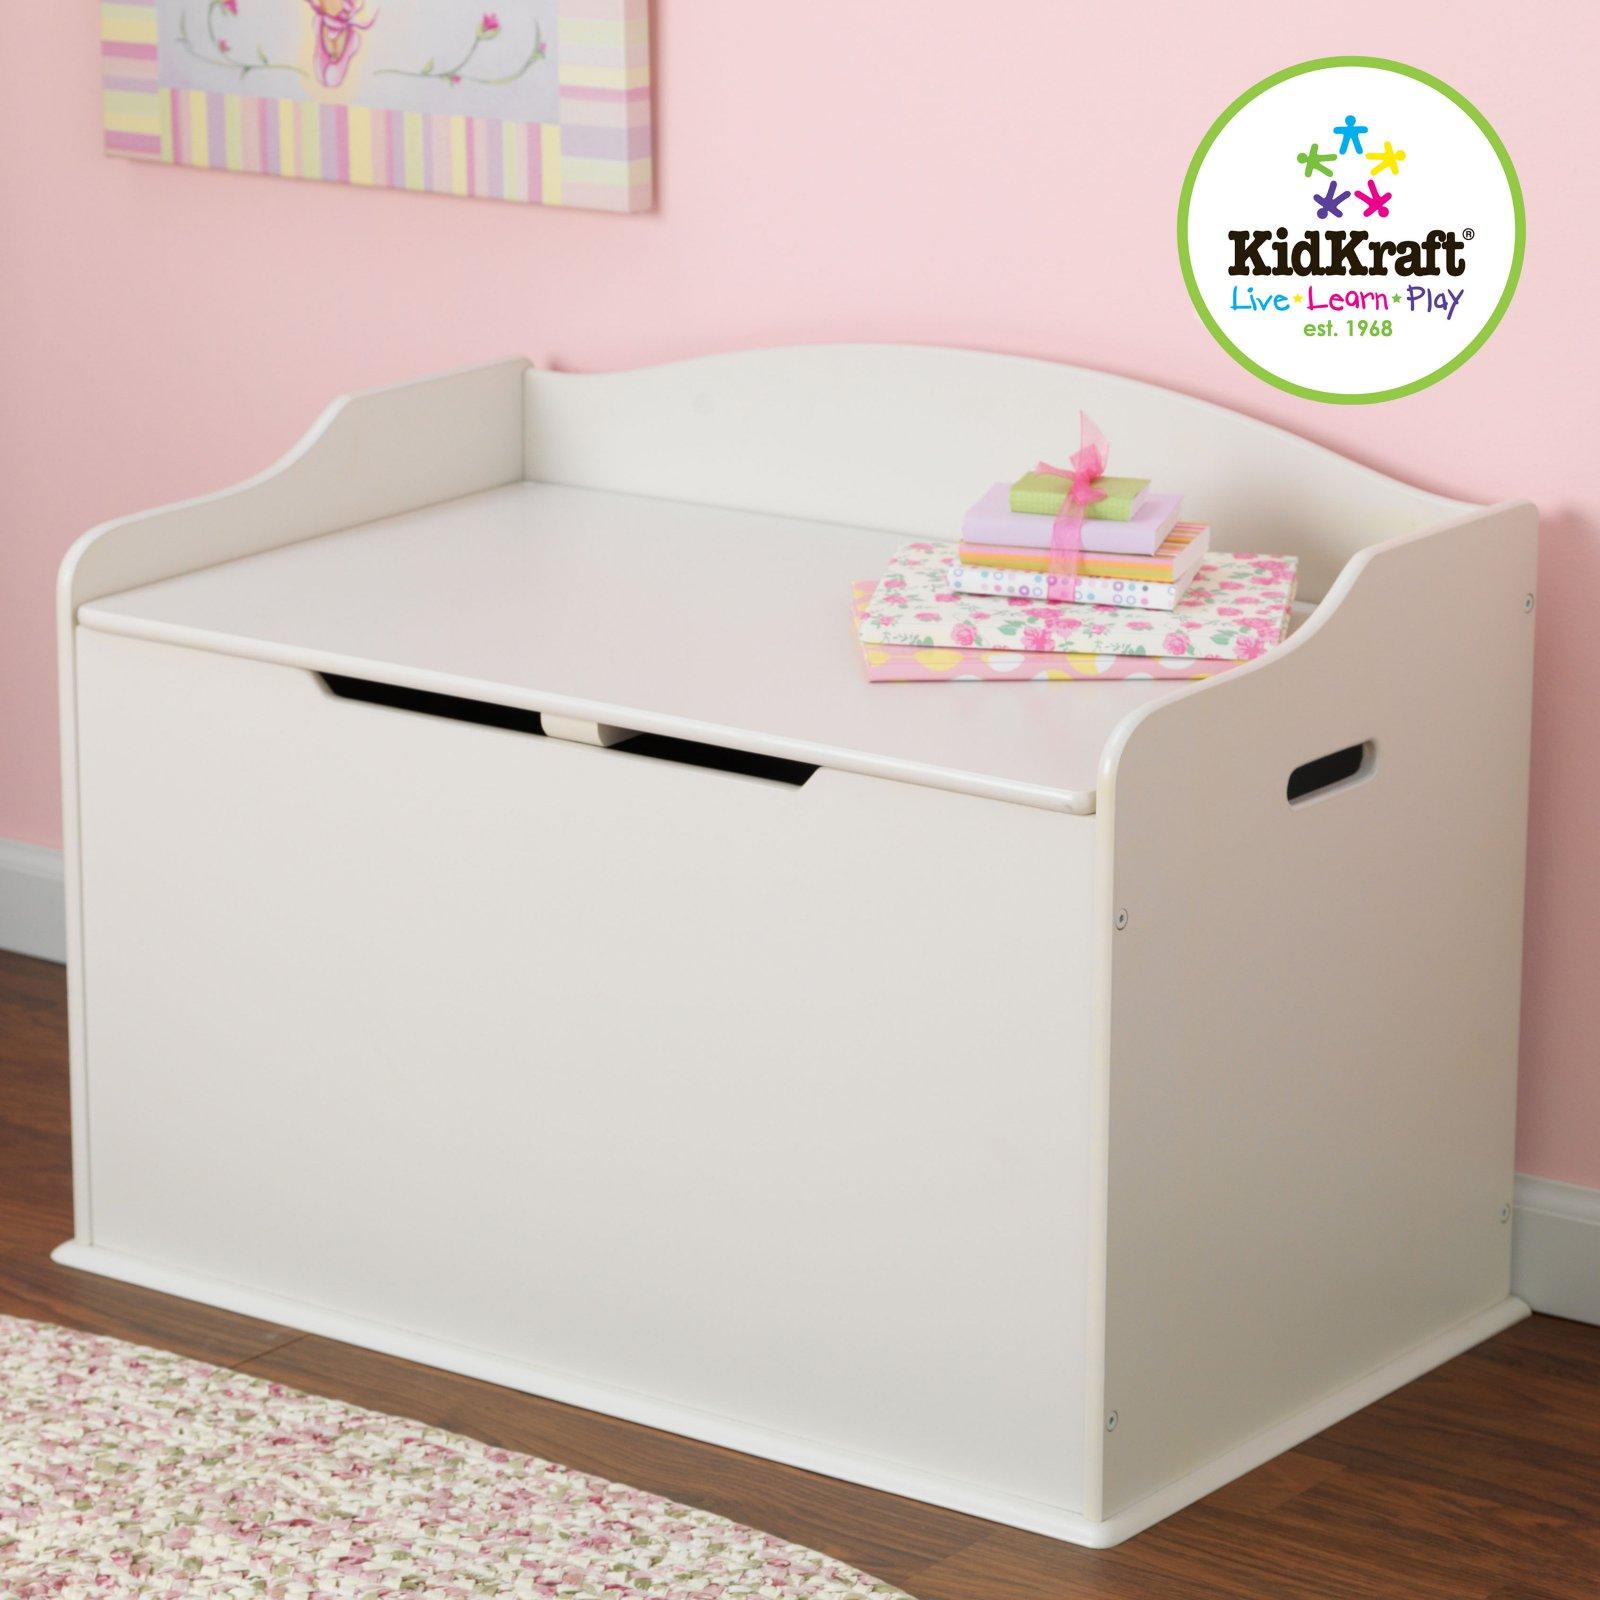 Kidkraft austin toy box natural 14953 - Kidkraft Austin Toy Box Natural 14953 16